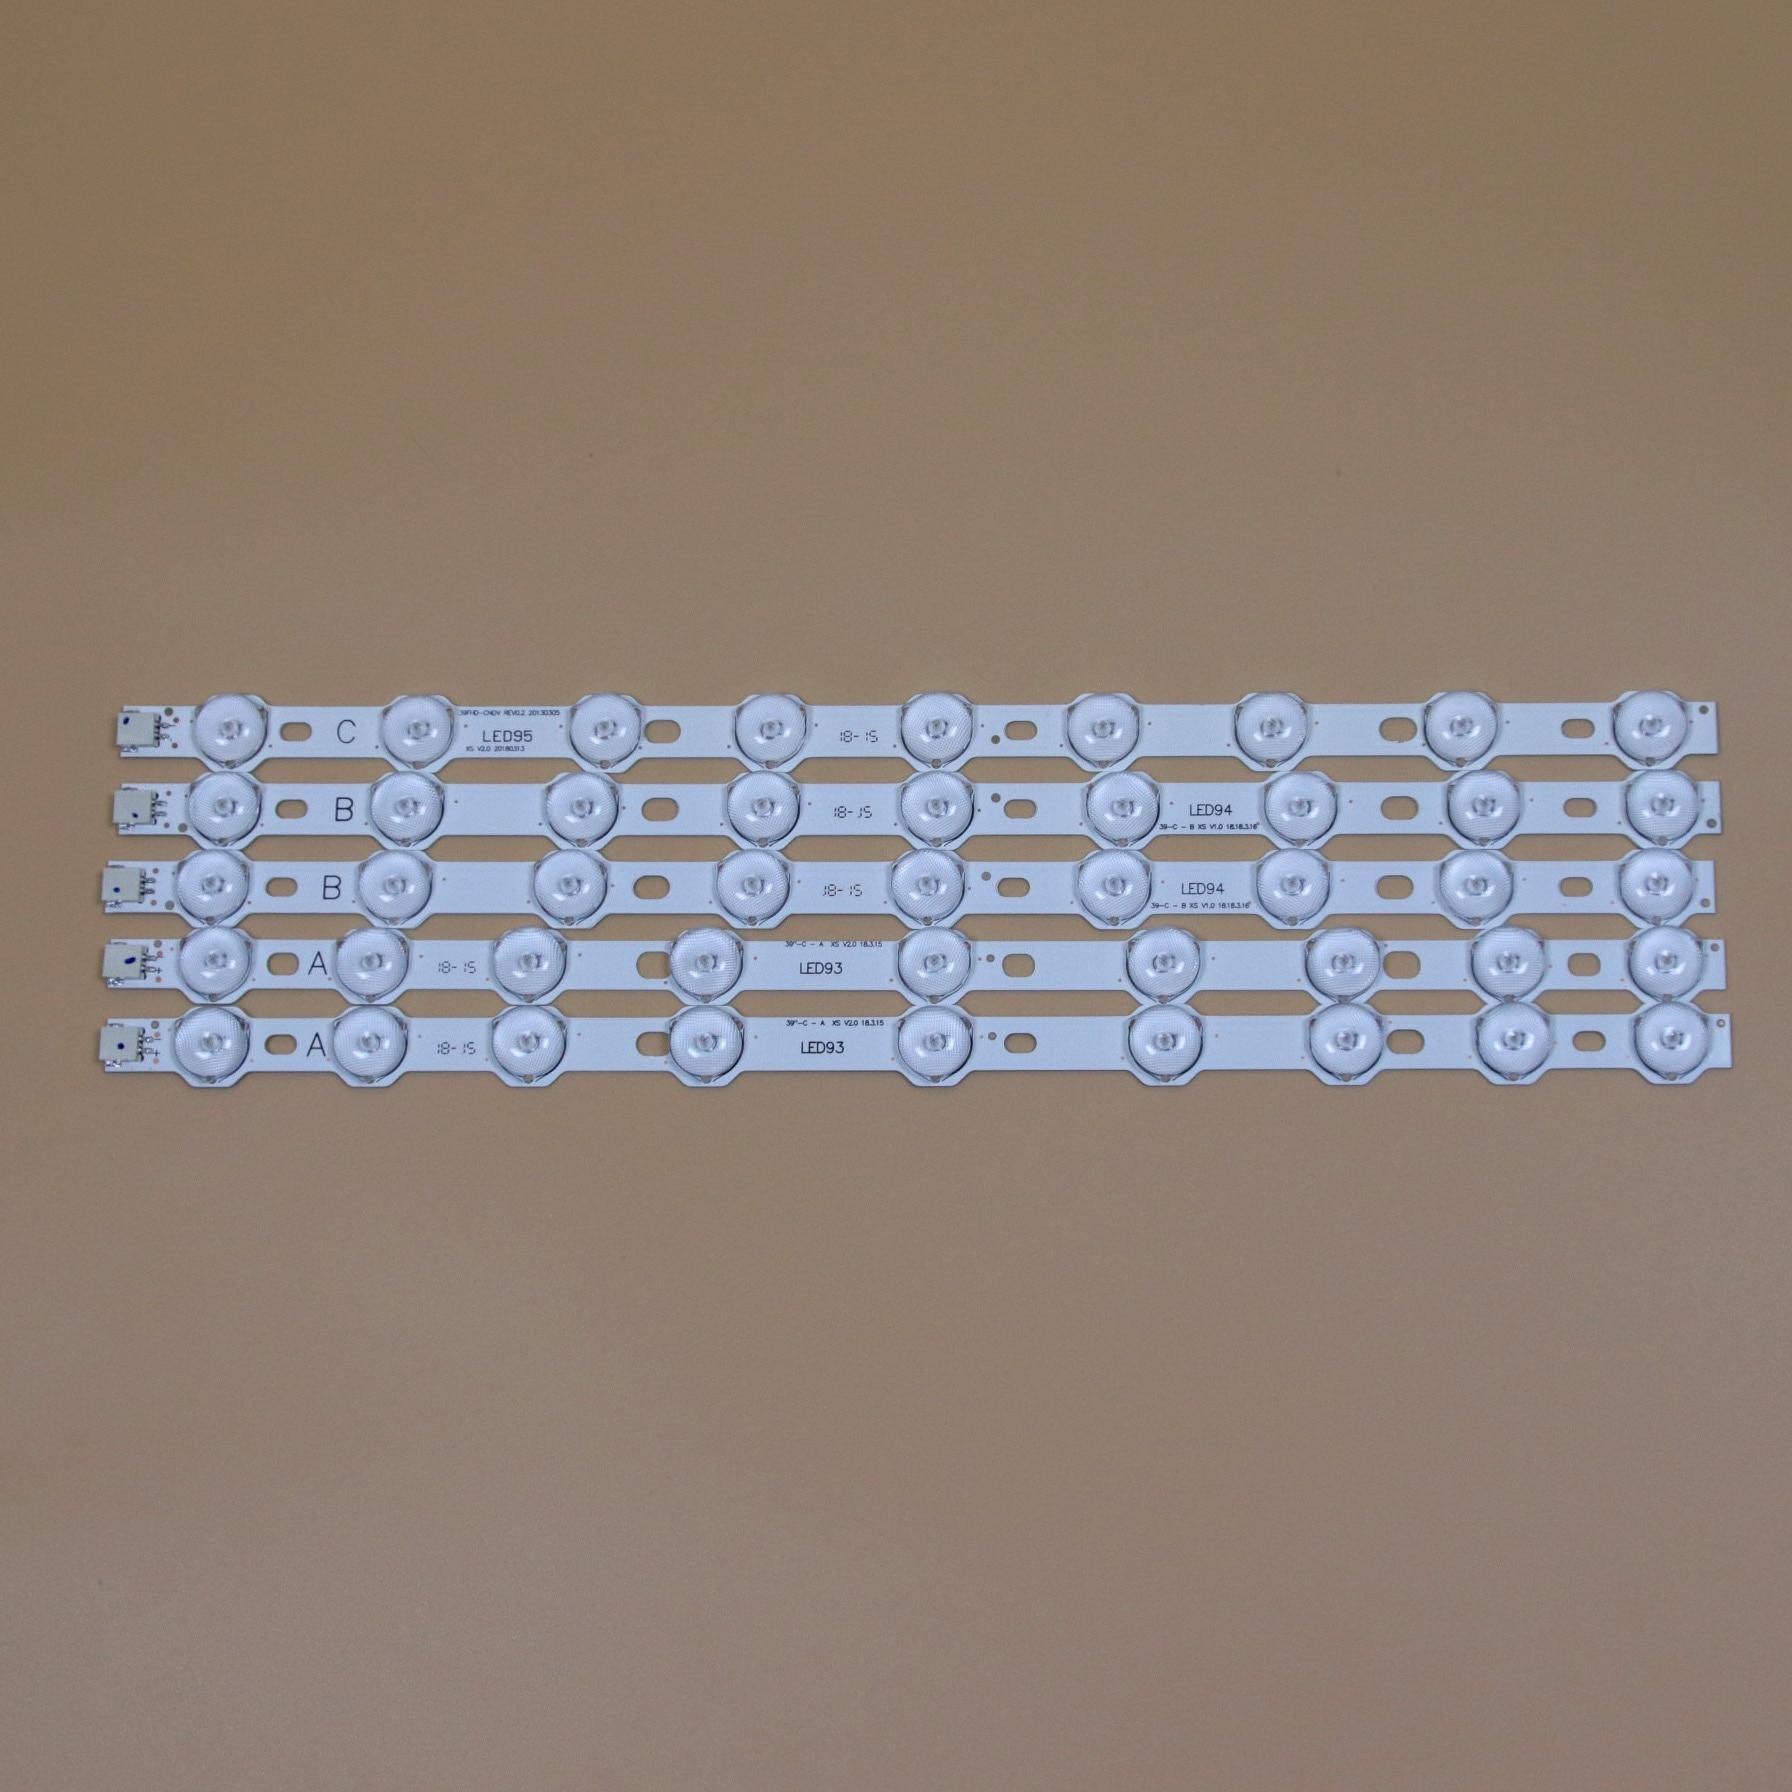 TV LED Bars For PHILIPS 40PFL3008H-12 40PFL3008K/12 40PFL3028H/12 40PFL3018H/12 LED Backlight Strips Kit 9LED Lamps Lens 5 Bands